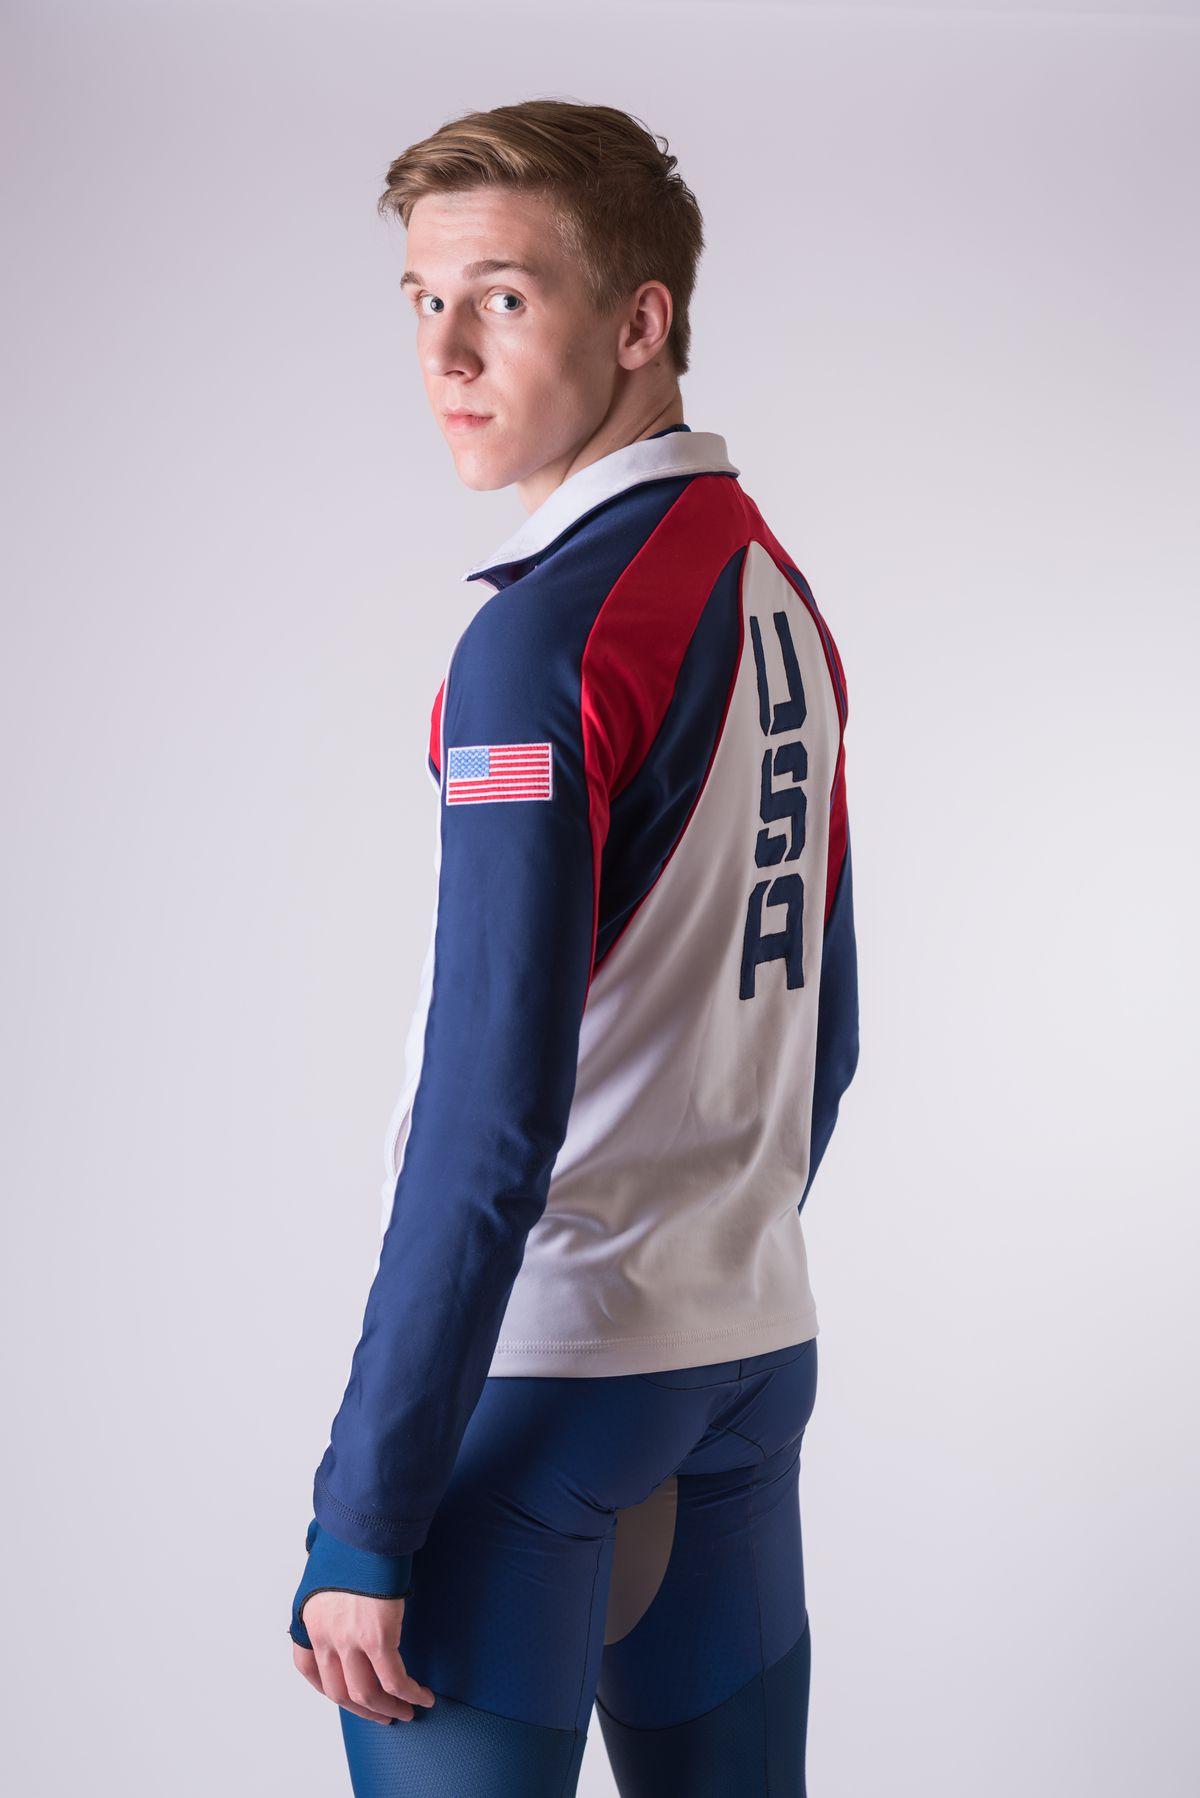 Conor McDermott-Mostowy skates for Team USA